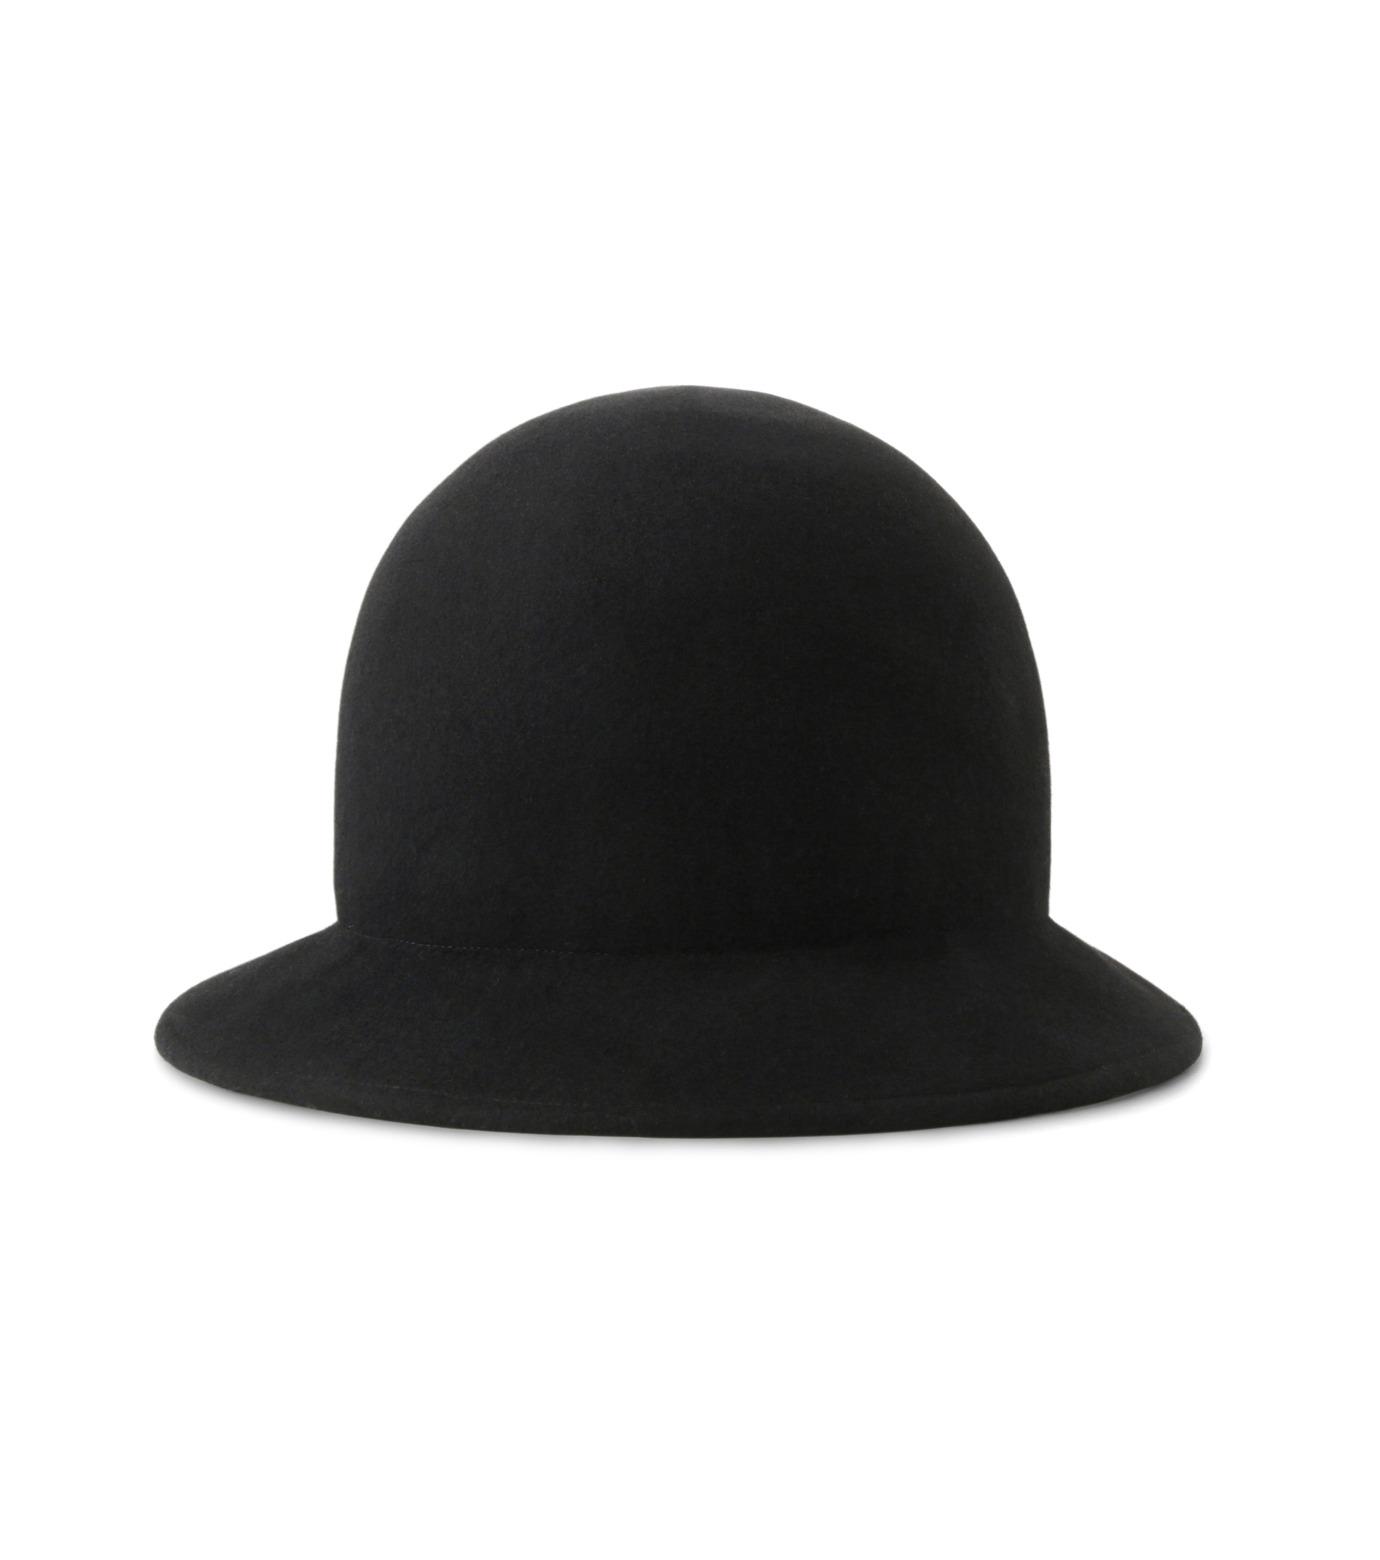 Sacai(サカイ)のHat-BLACK(キャップ/cap)-17-01274M-13 拡大詳細画像2